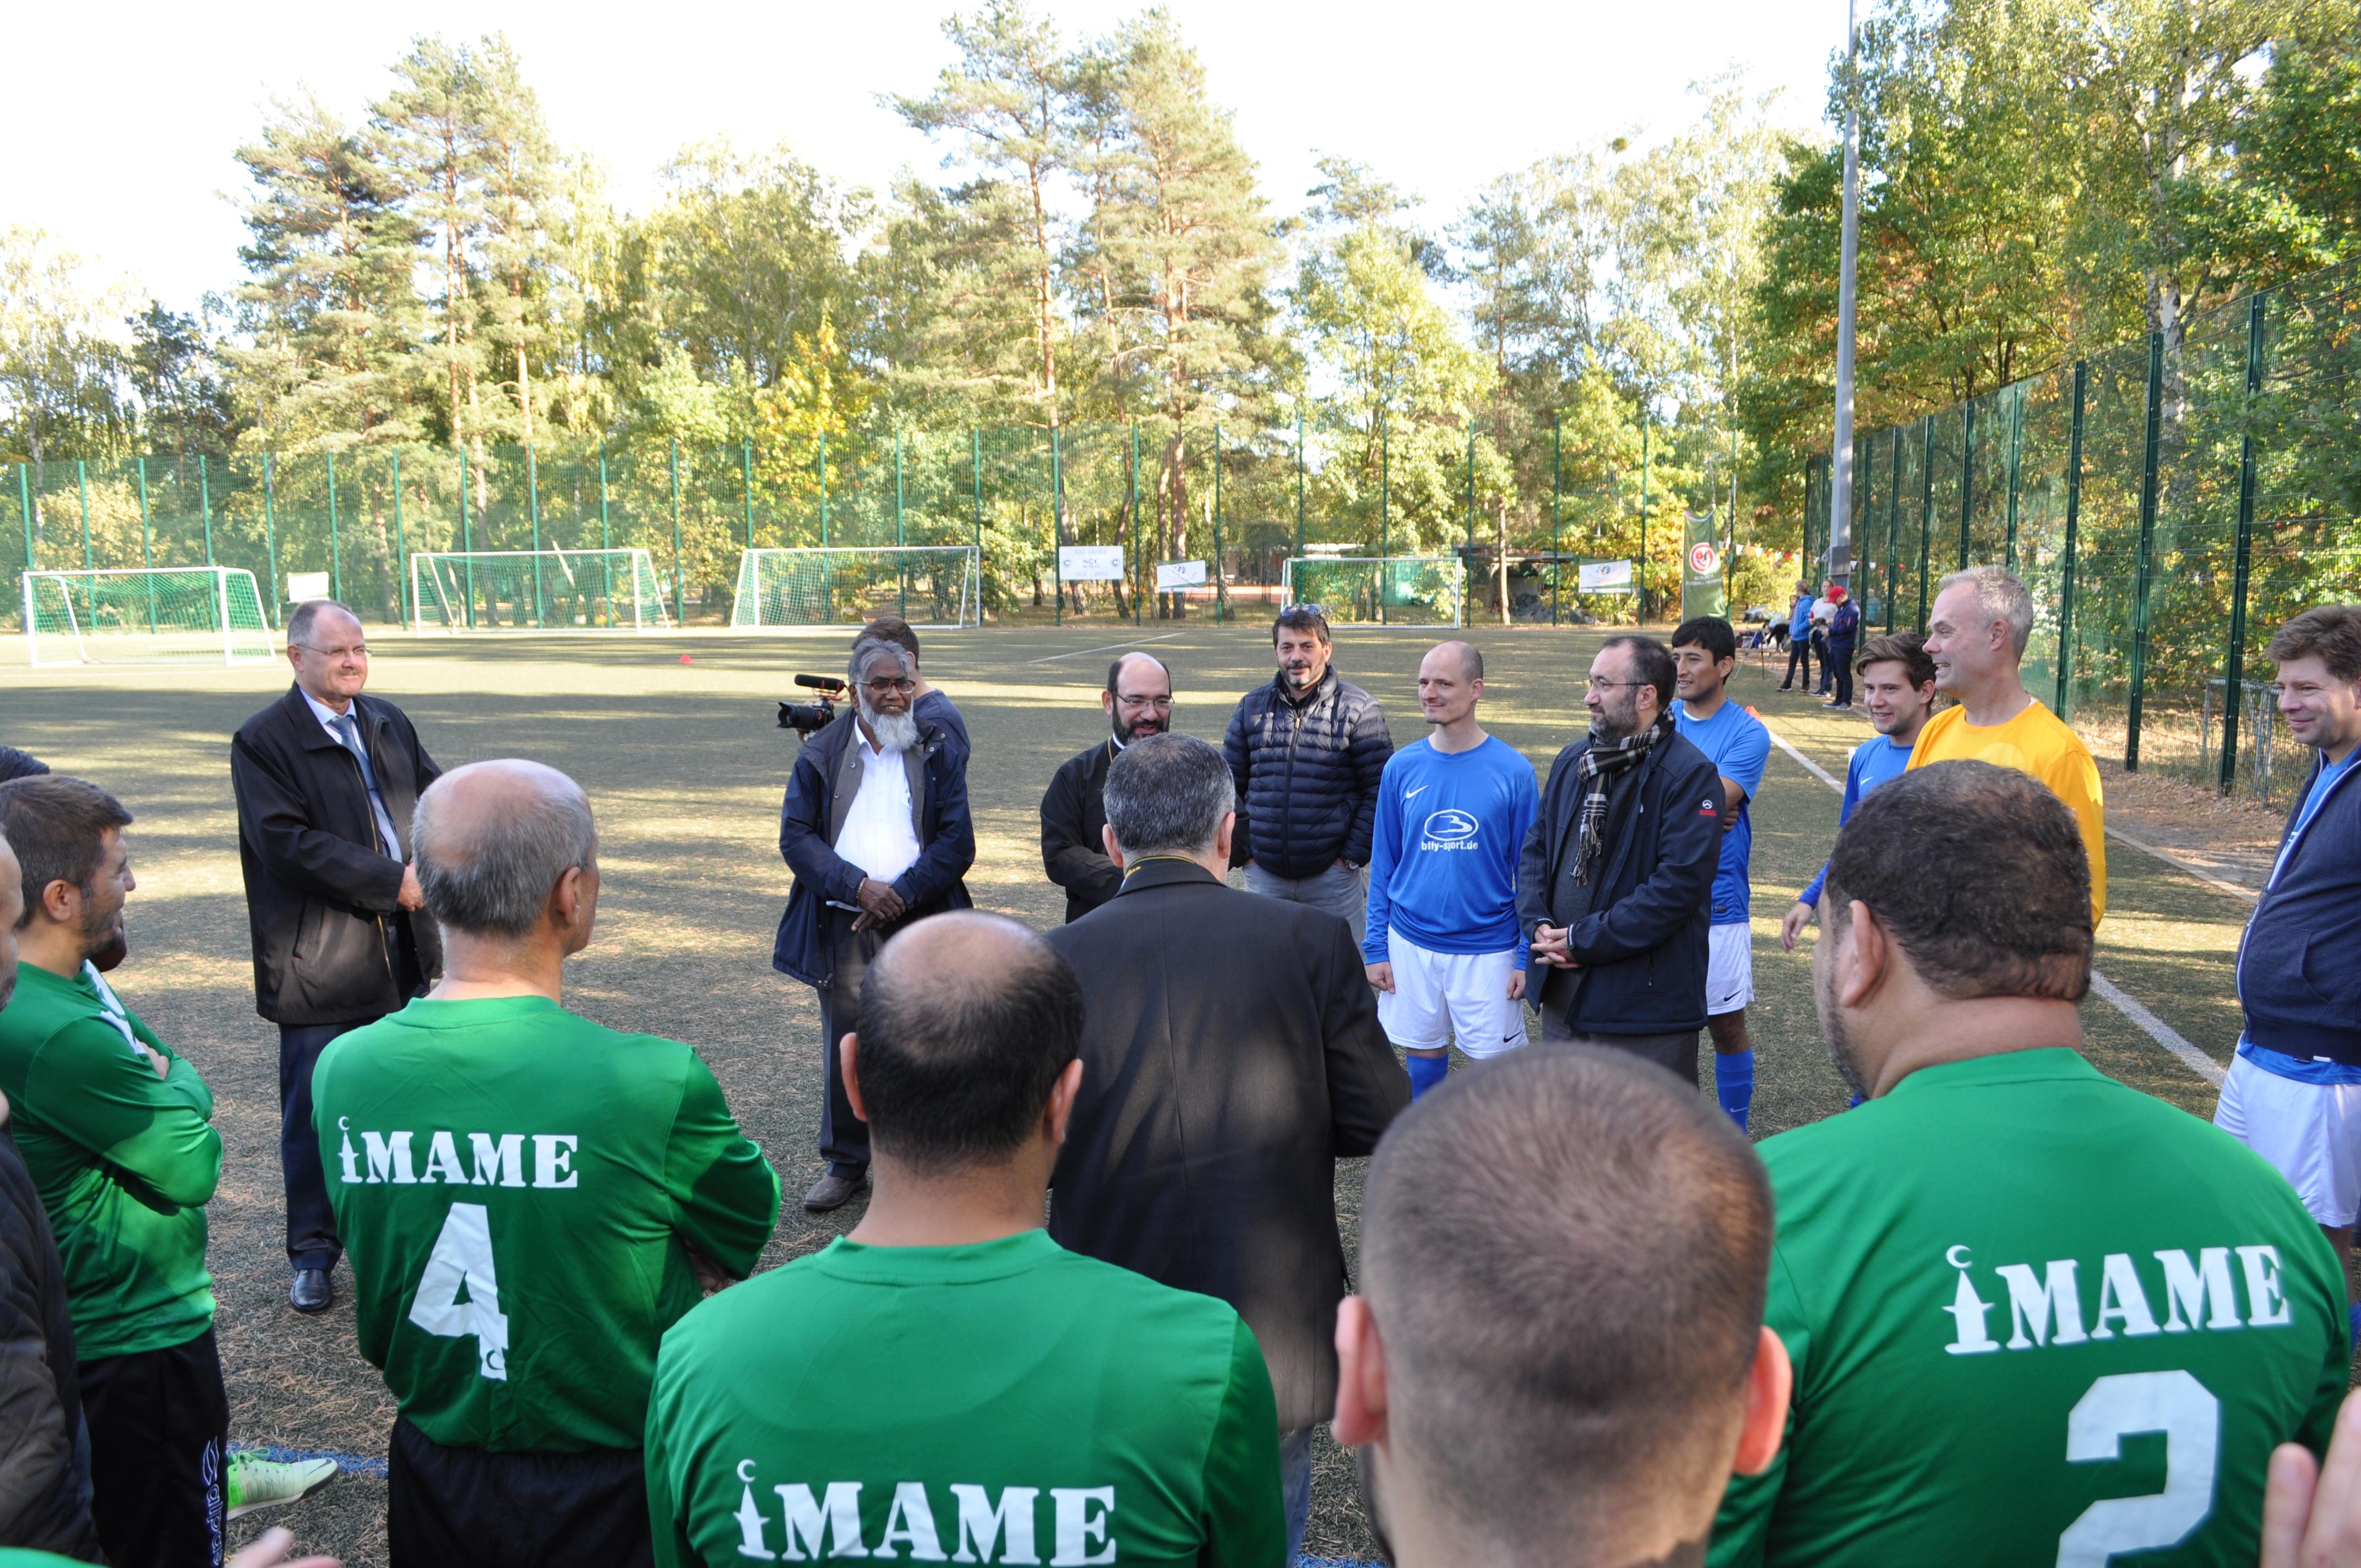 Pfarrer gegen Imame 2018 ǀ Berliner Fußball-Verband e  V